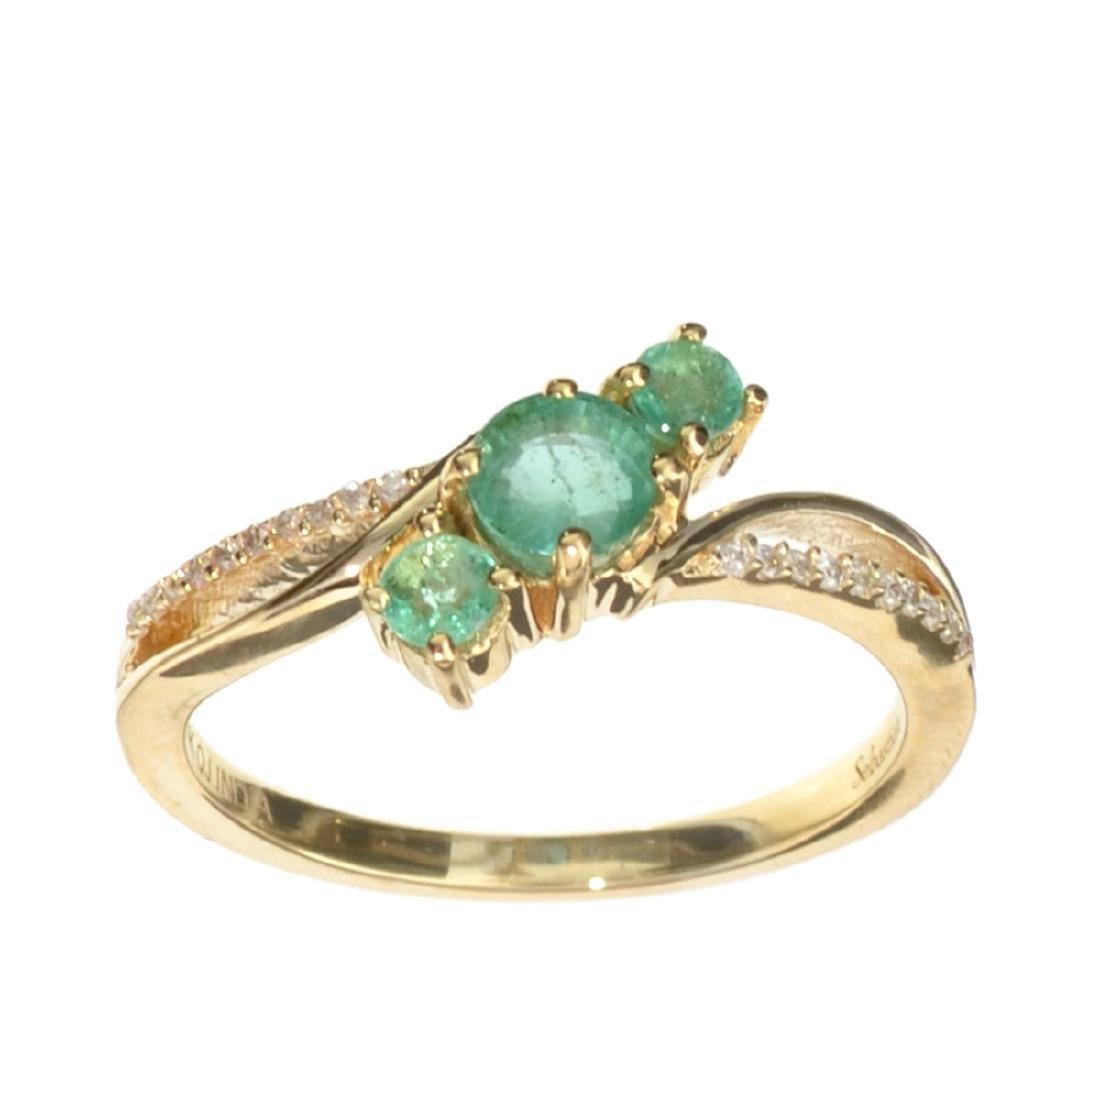 Designer Sebastian 14KT Gold, 0.62CT Round Cut Emerald